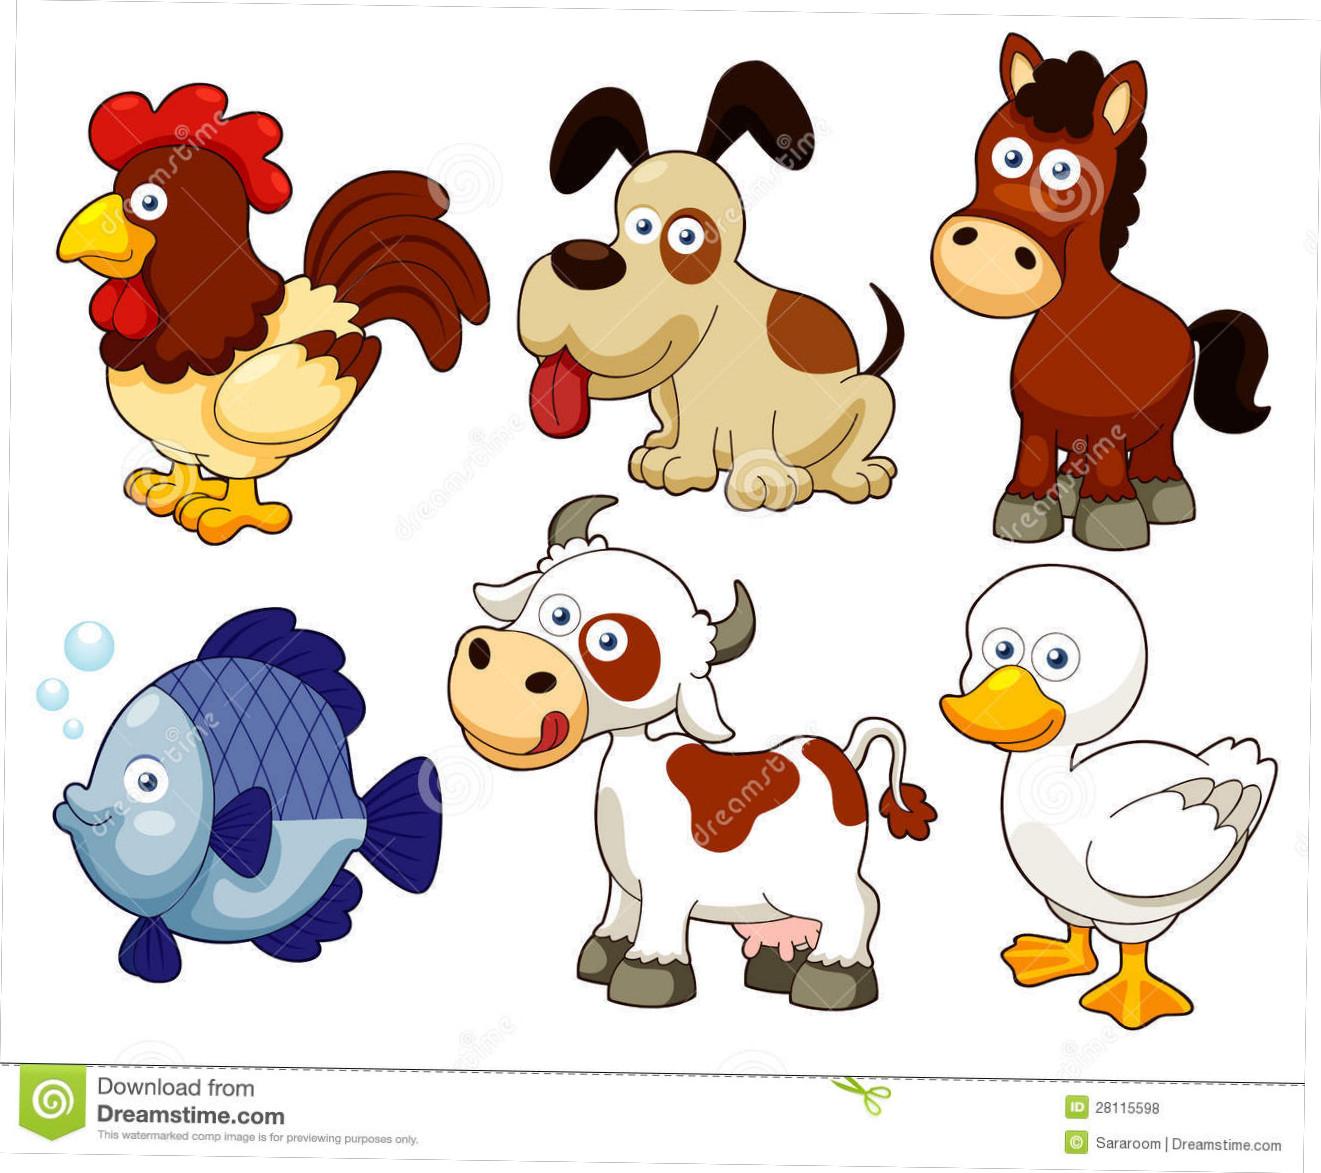 Free Printable Farm Animal Cutouts 2018 – Ilcorrieredispagna - Free Printable Farm Animal Clipart